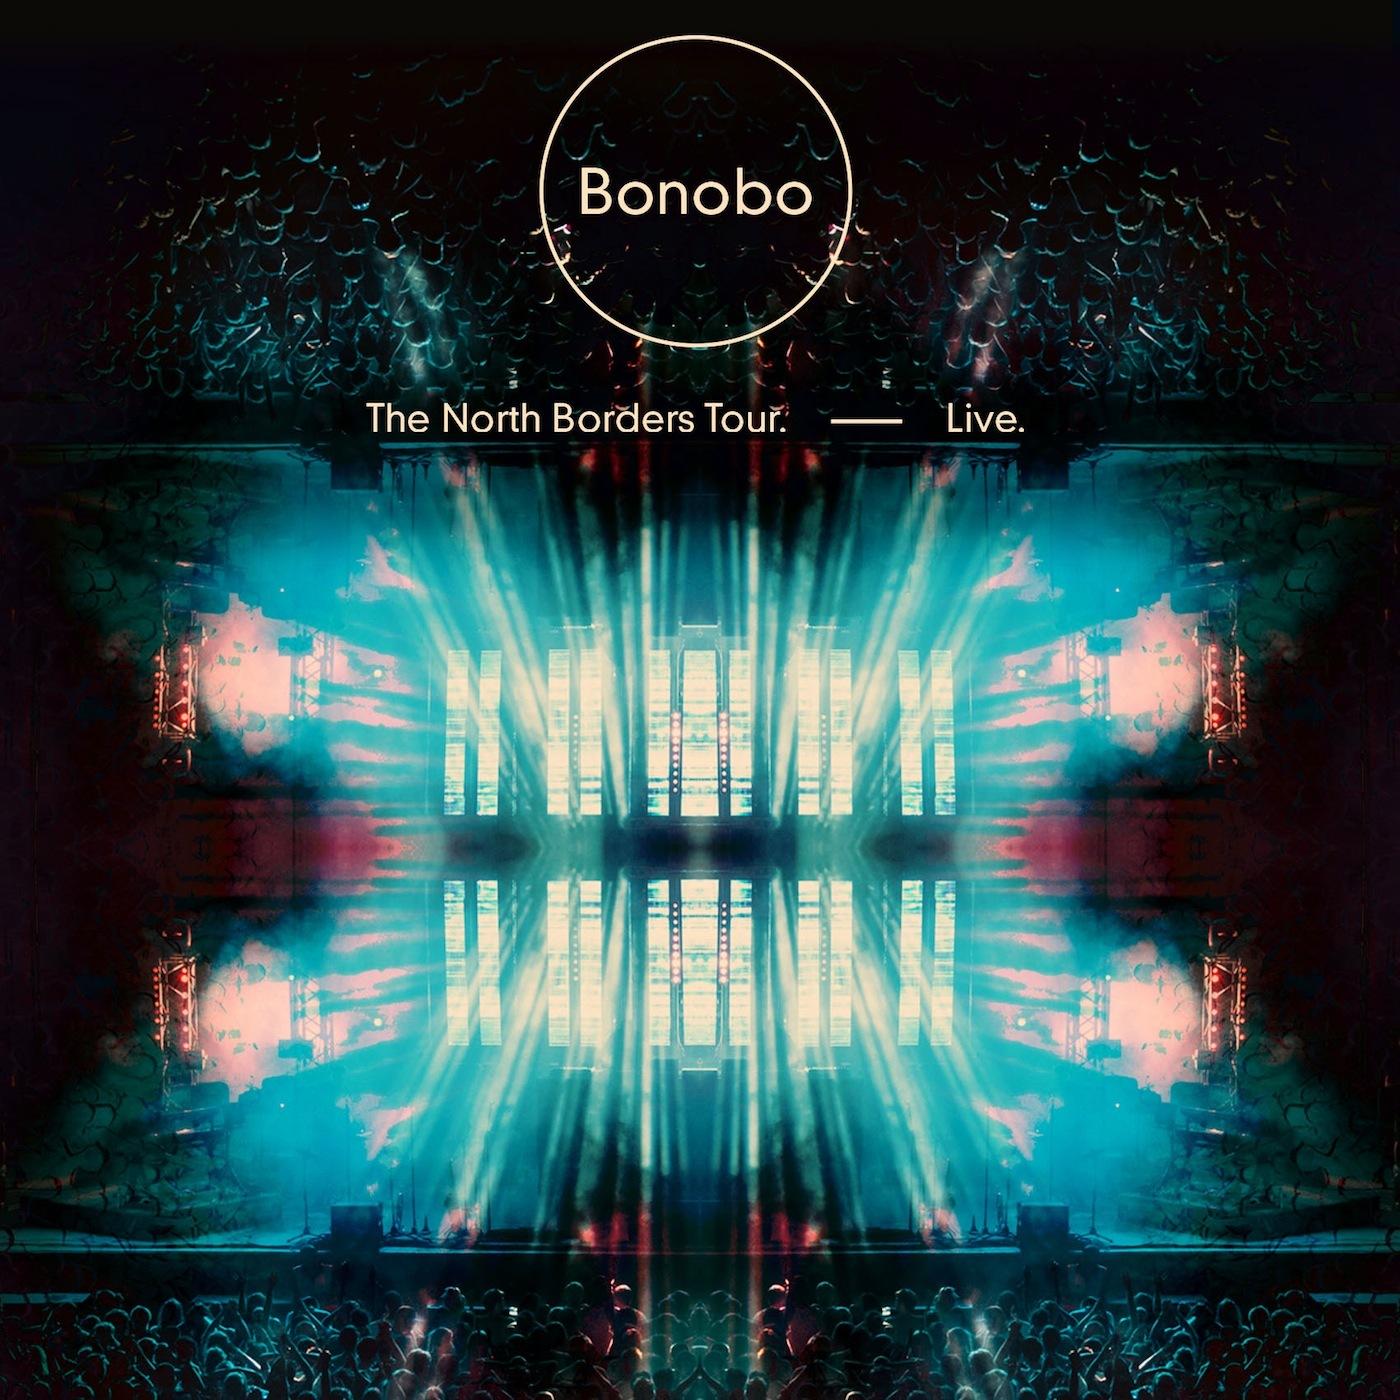 Bonobo - The North Borders Tour